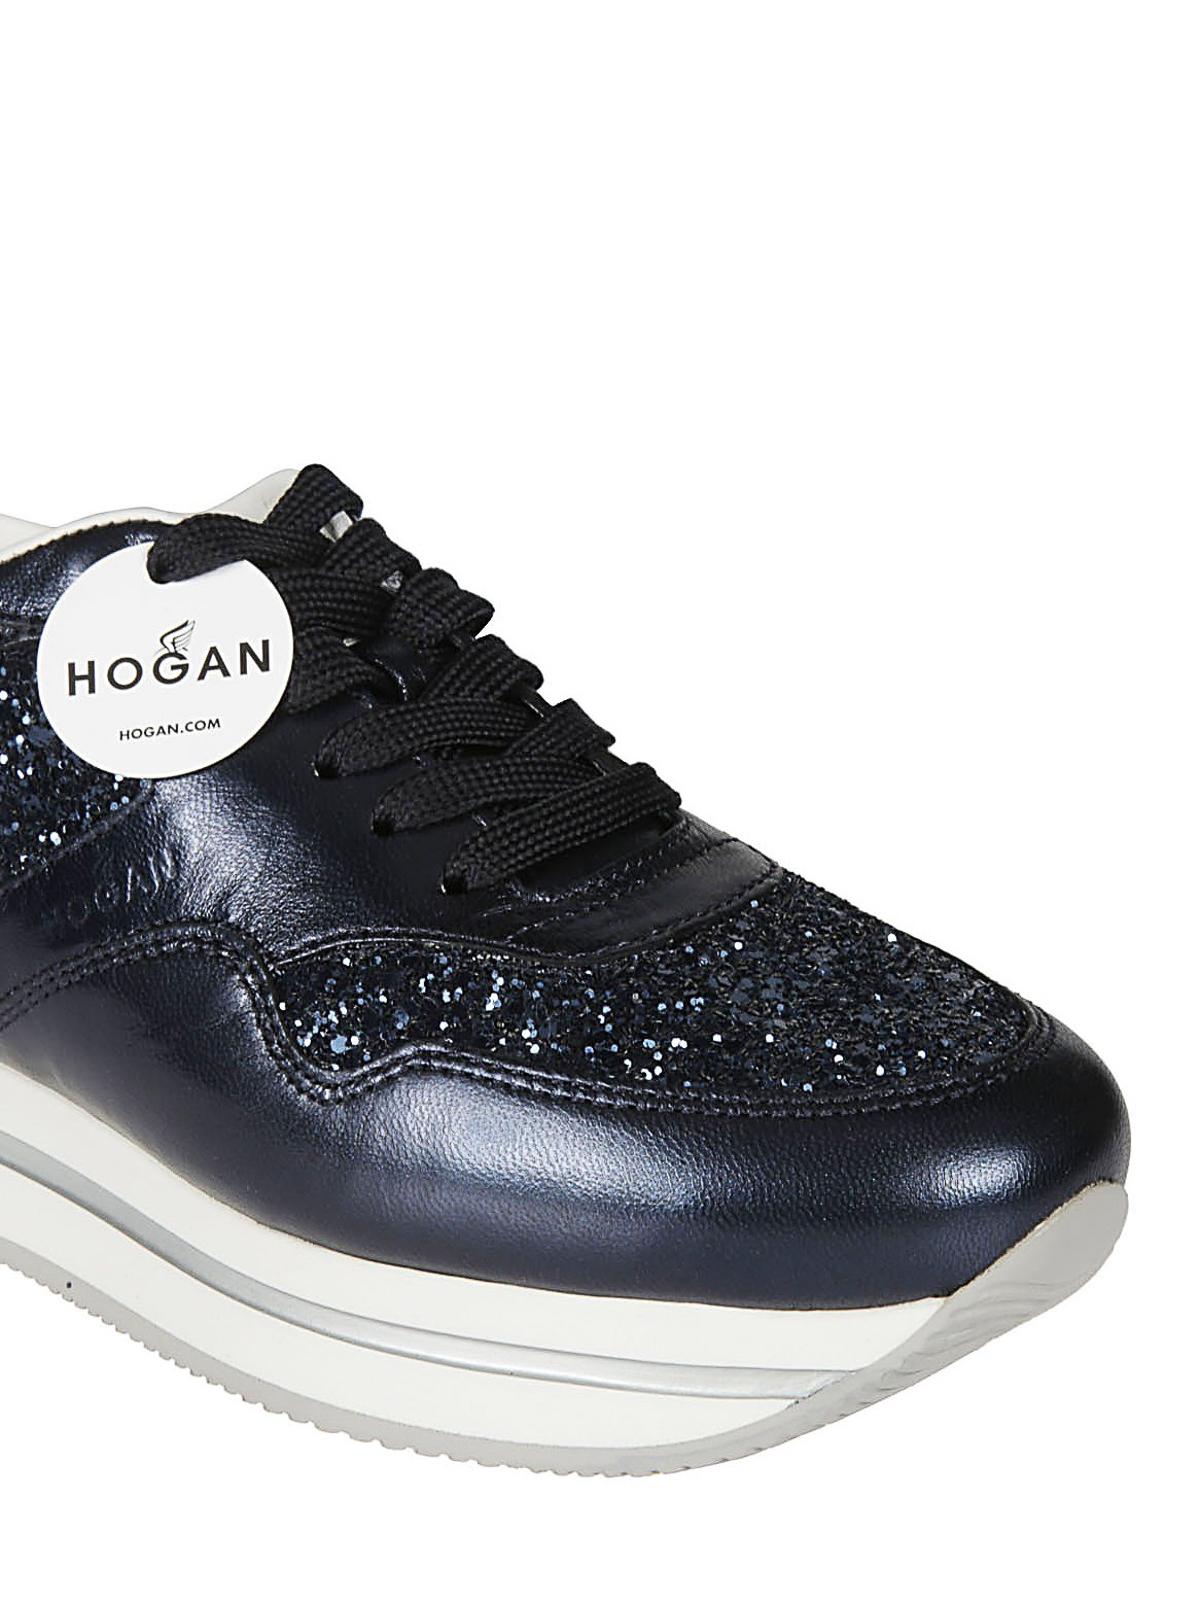 Hogan - H222 blue sneakers - trainers - HXW2220N62DKGR2A22 | iKRIX.com